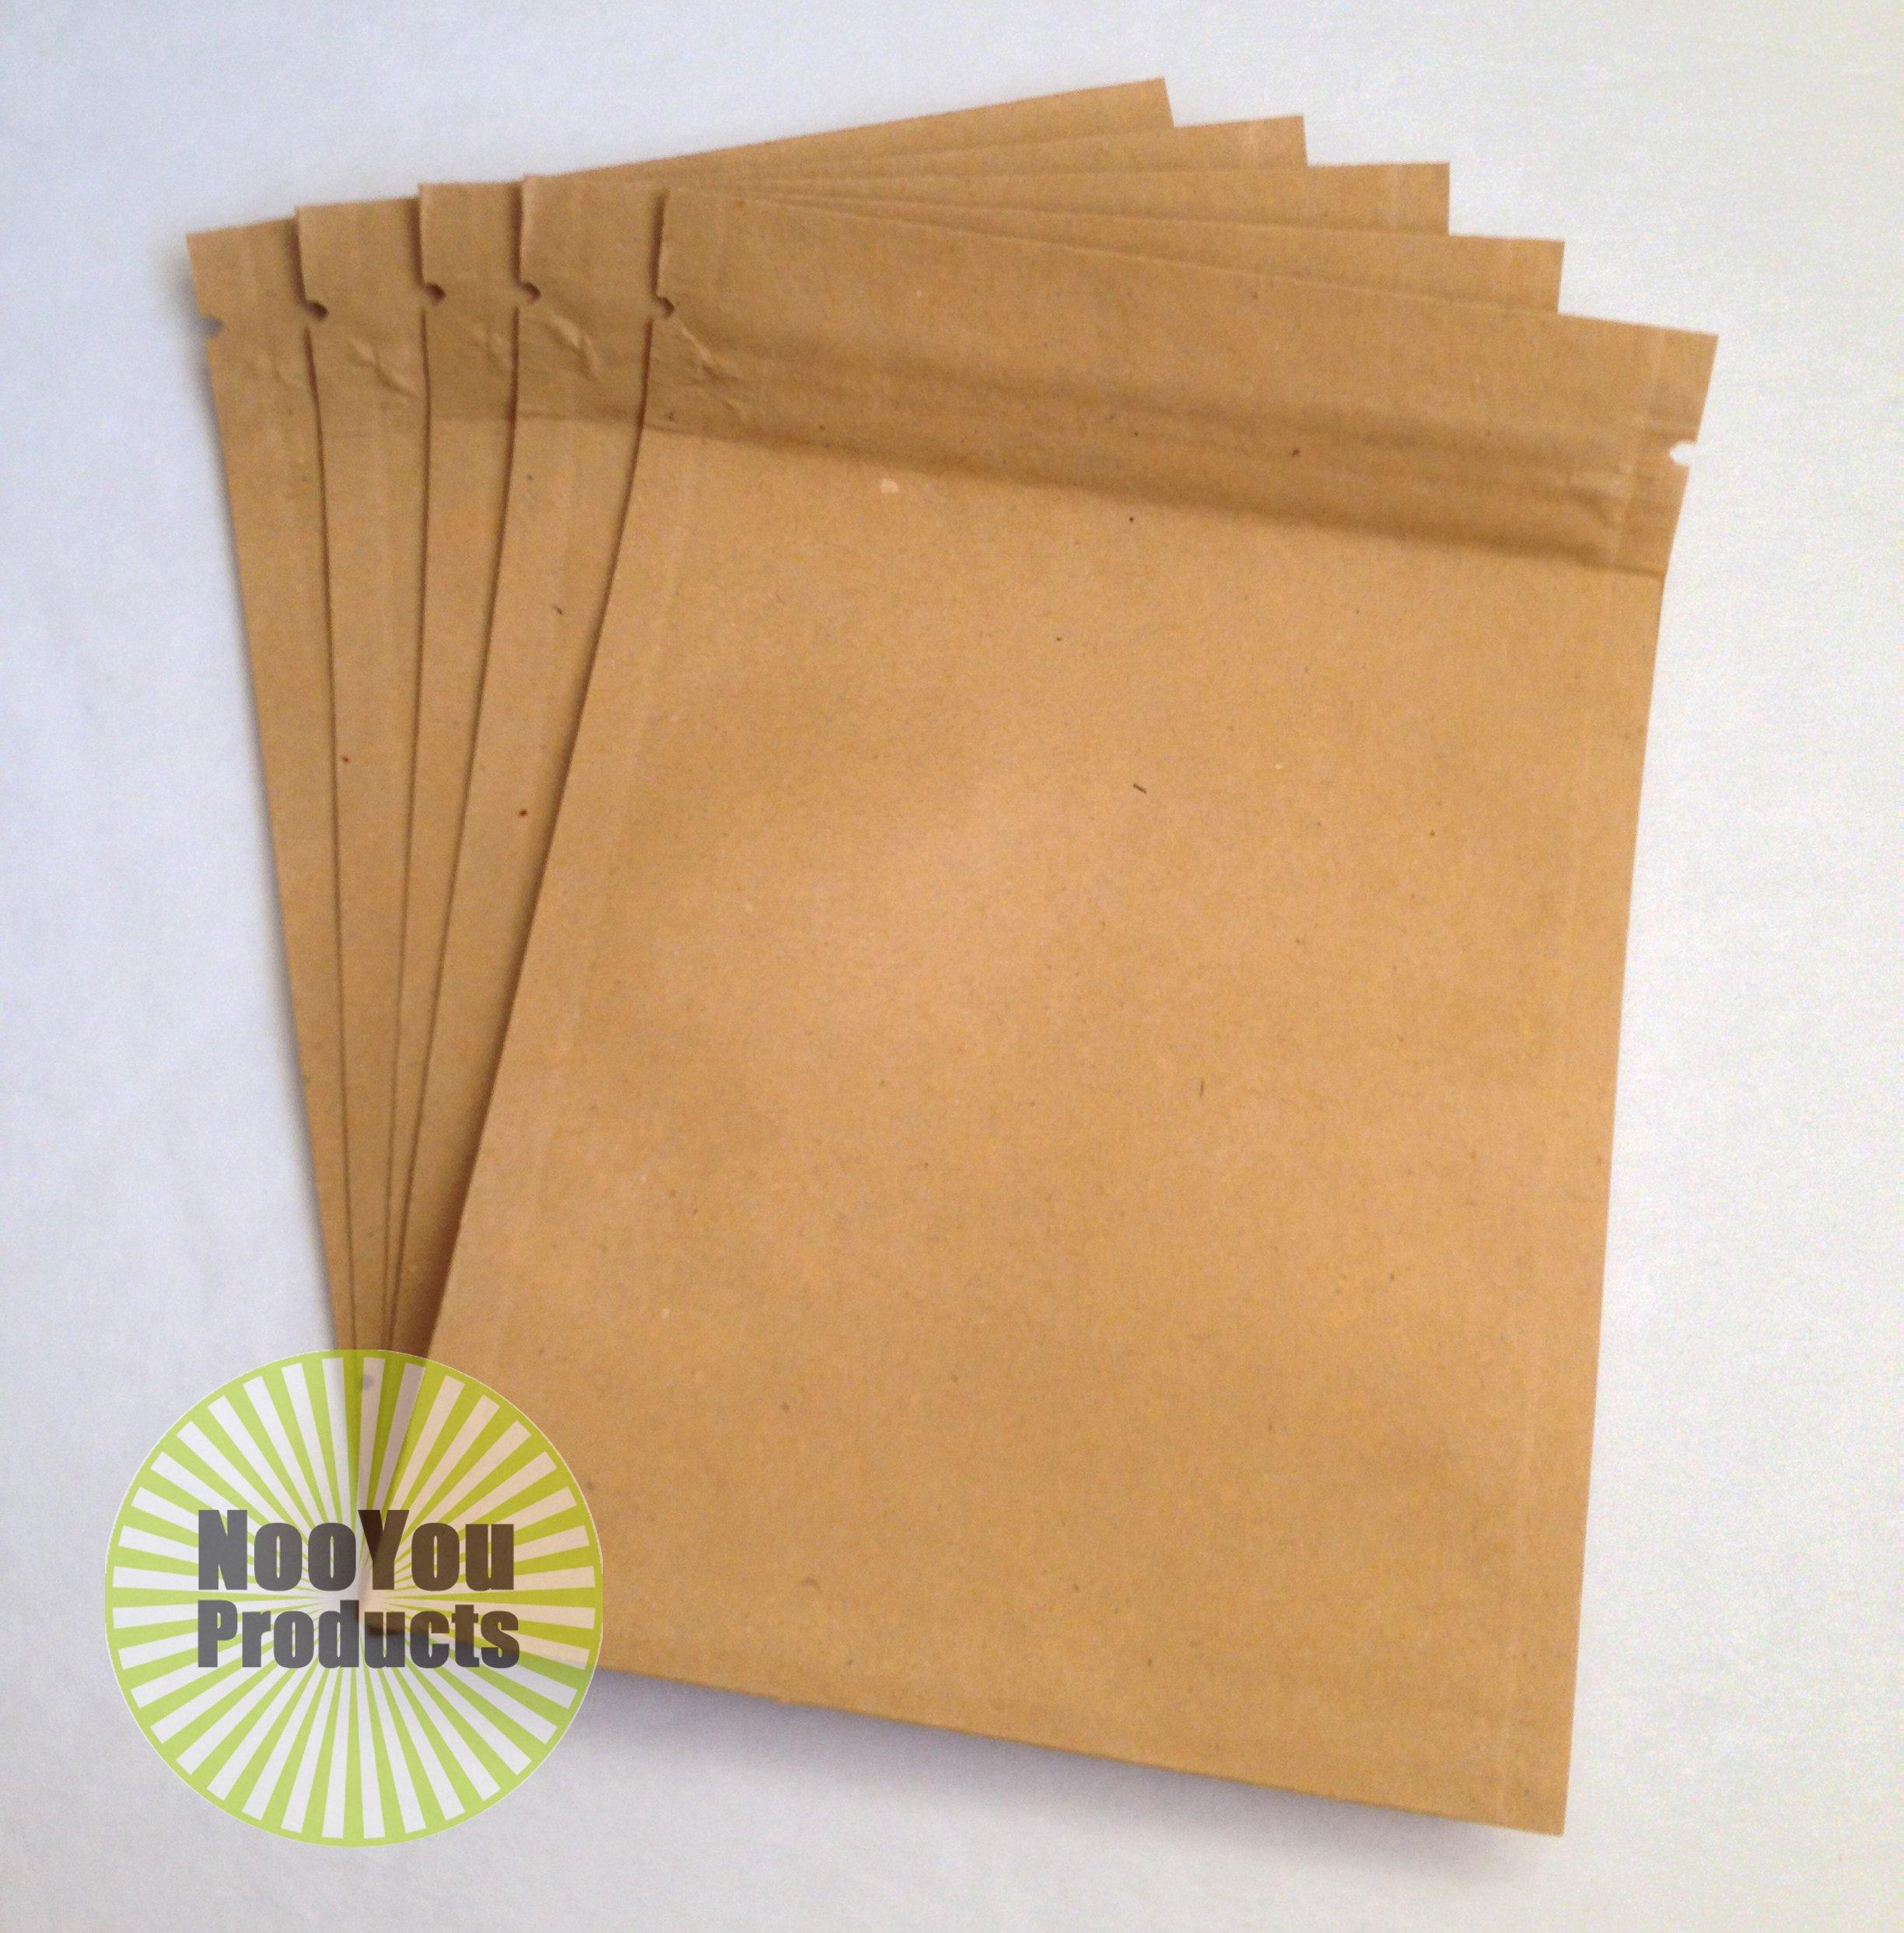 Brown Kraft Paper 3.5''x5'' Heat Seal Bags, Safe Food Storage, Smell Proof Product Packaging, Durable Reusable Survivalist Baggies (Herbs, Seeds, Tea, Coffee, Pharma) Snack Size Bakery Bag (1,000)